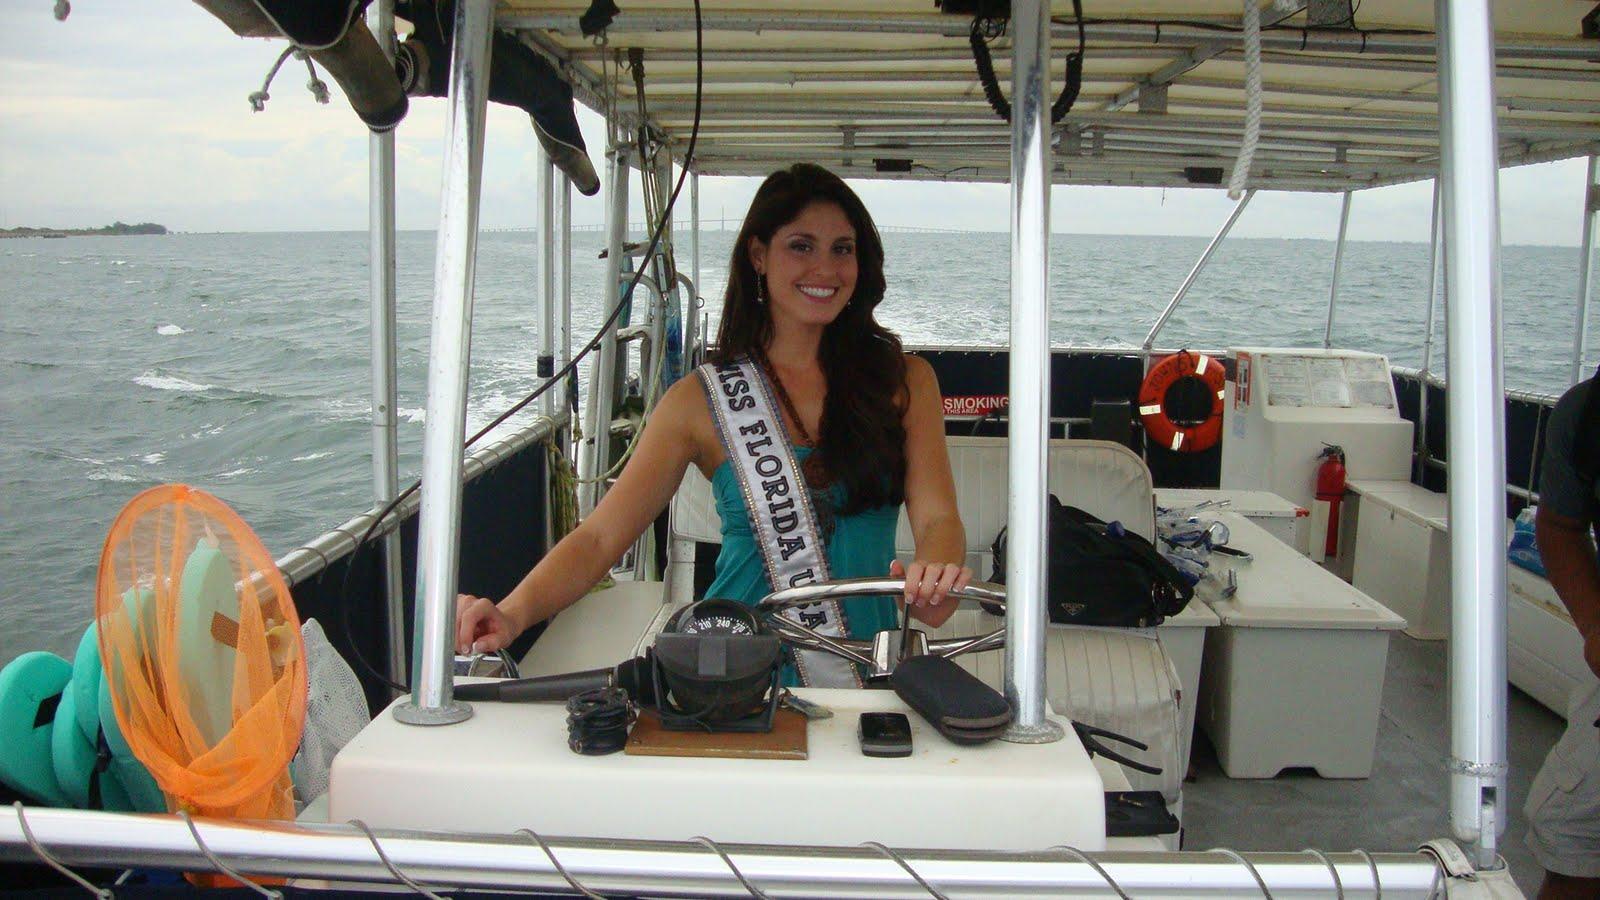 Miss Florida USA 2010 - Megan Clementi DSC01963